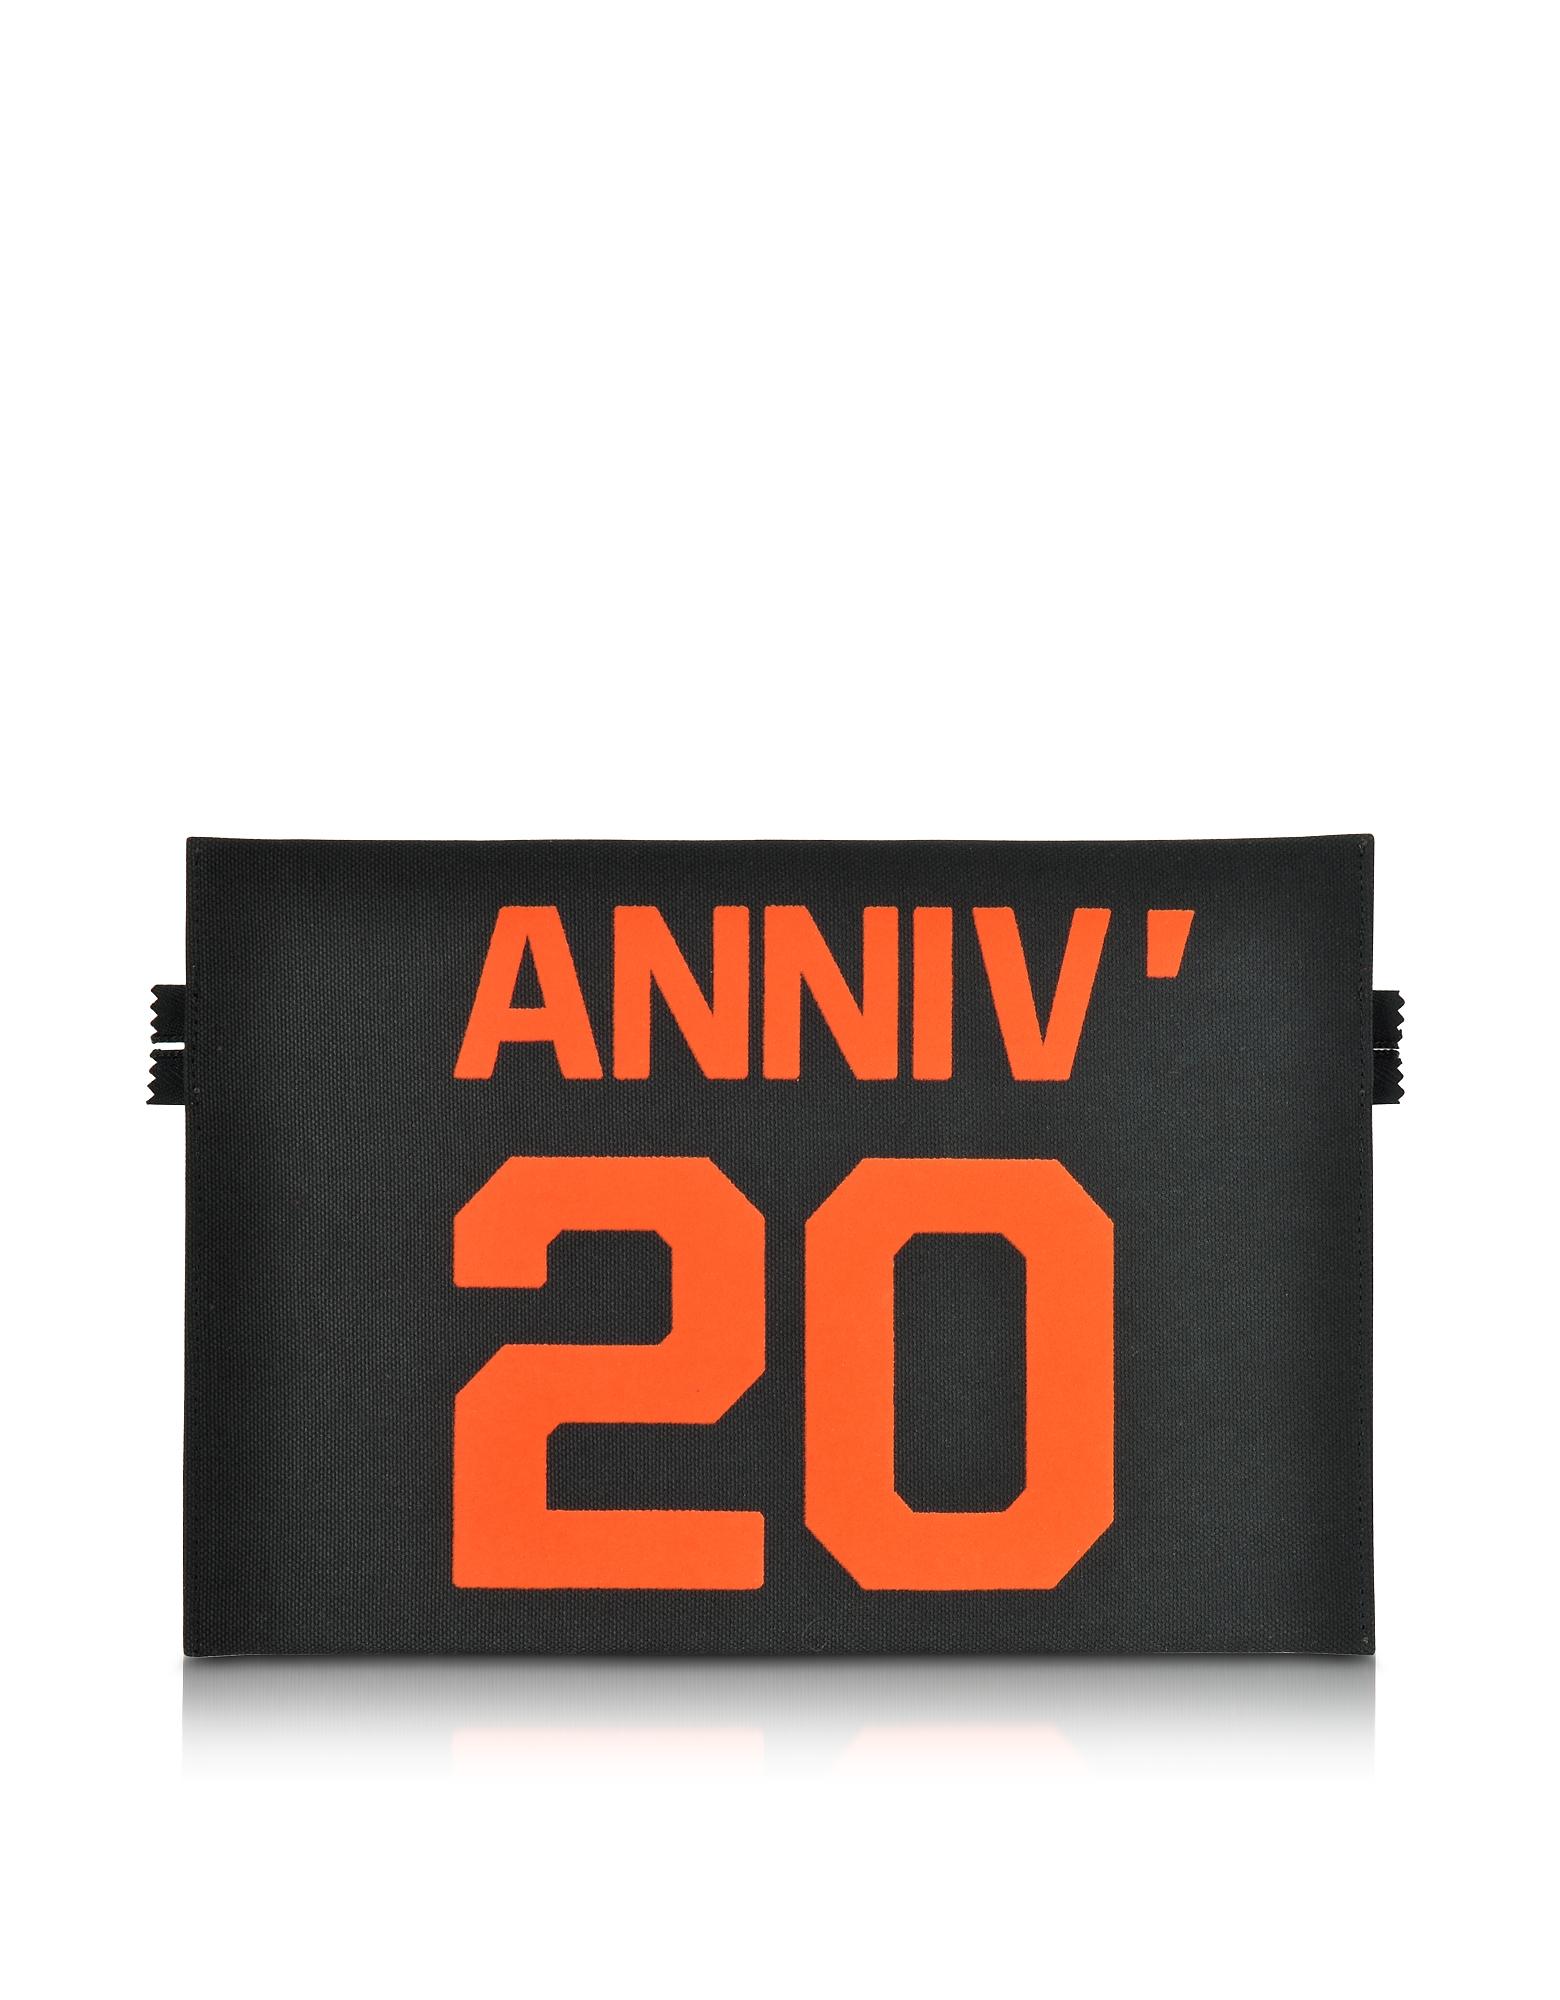 Anniversary 20 - Плоский Клатч из Ткани